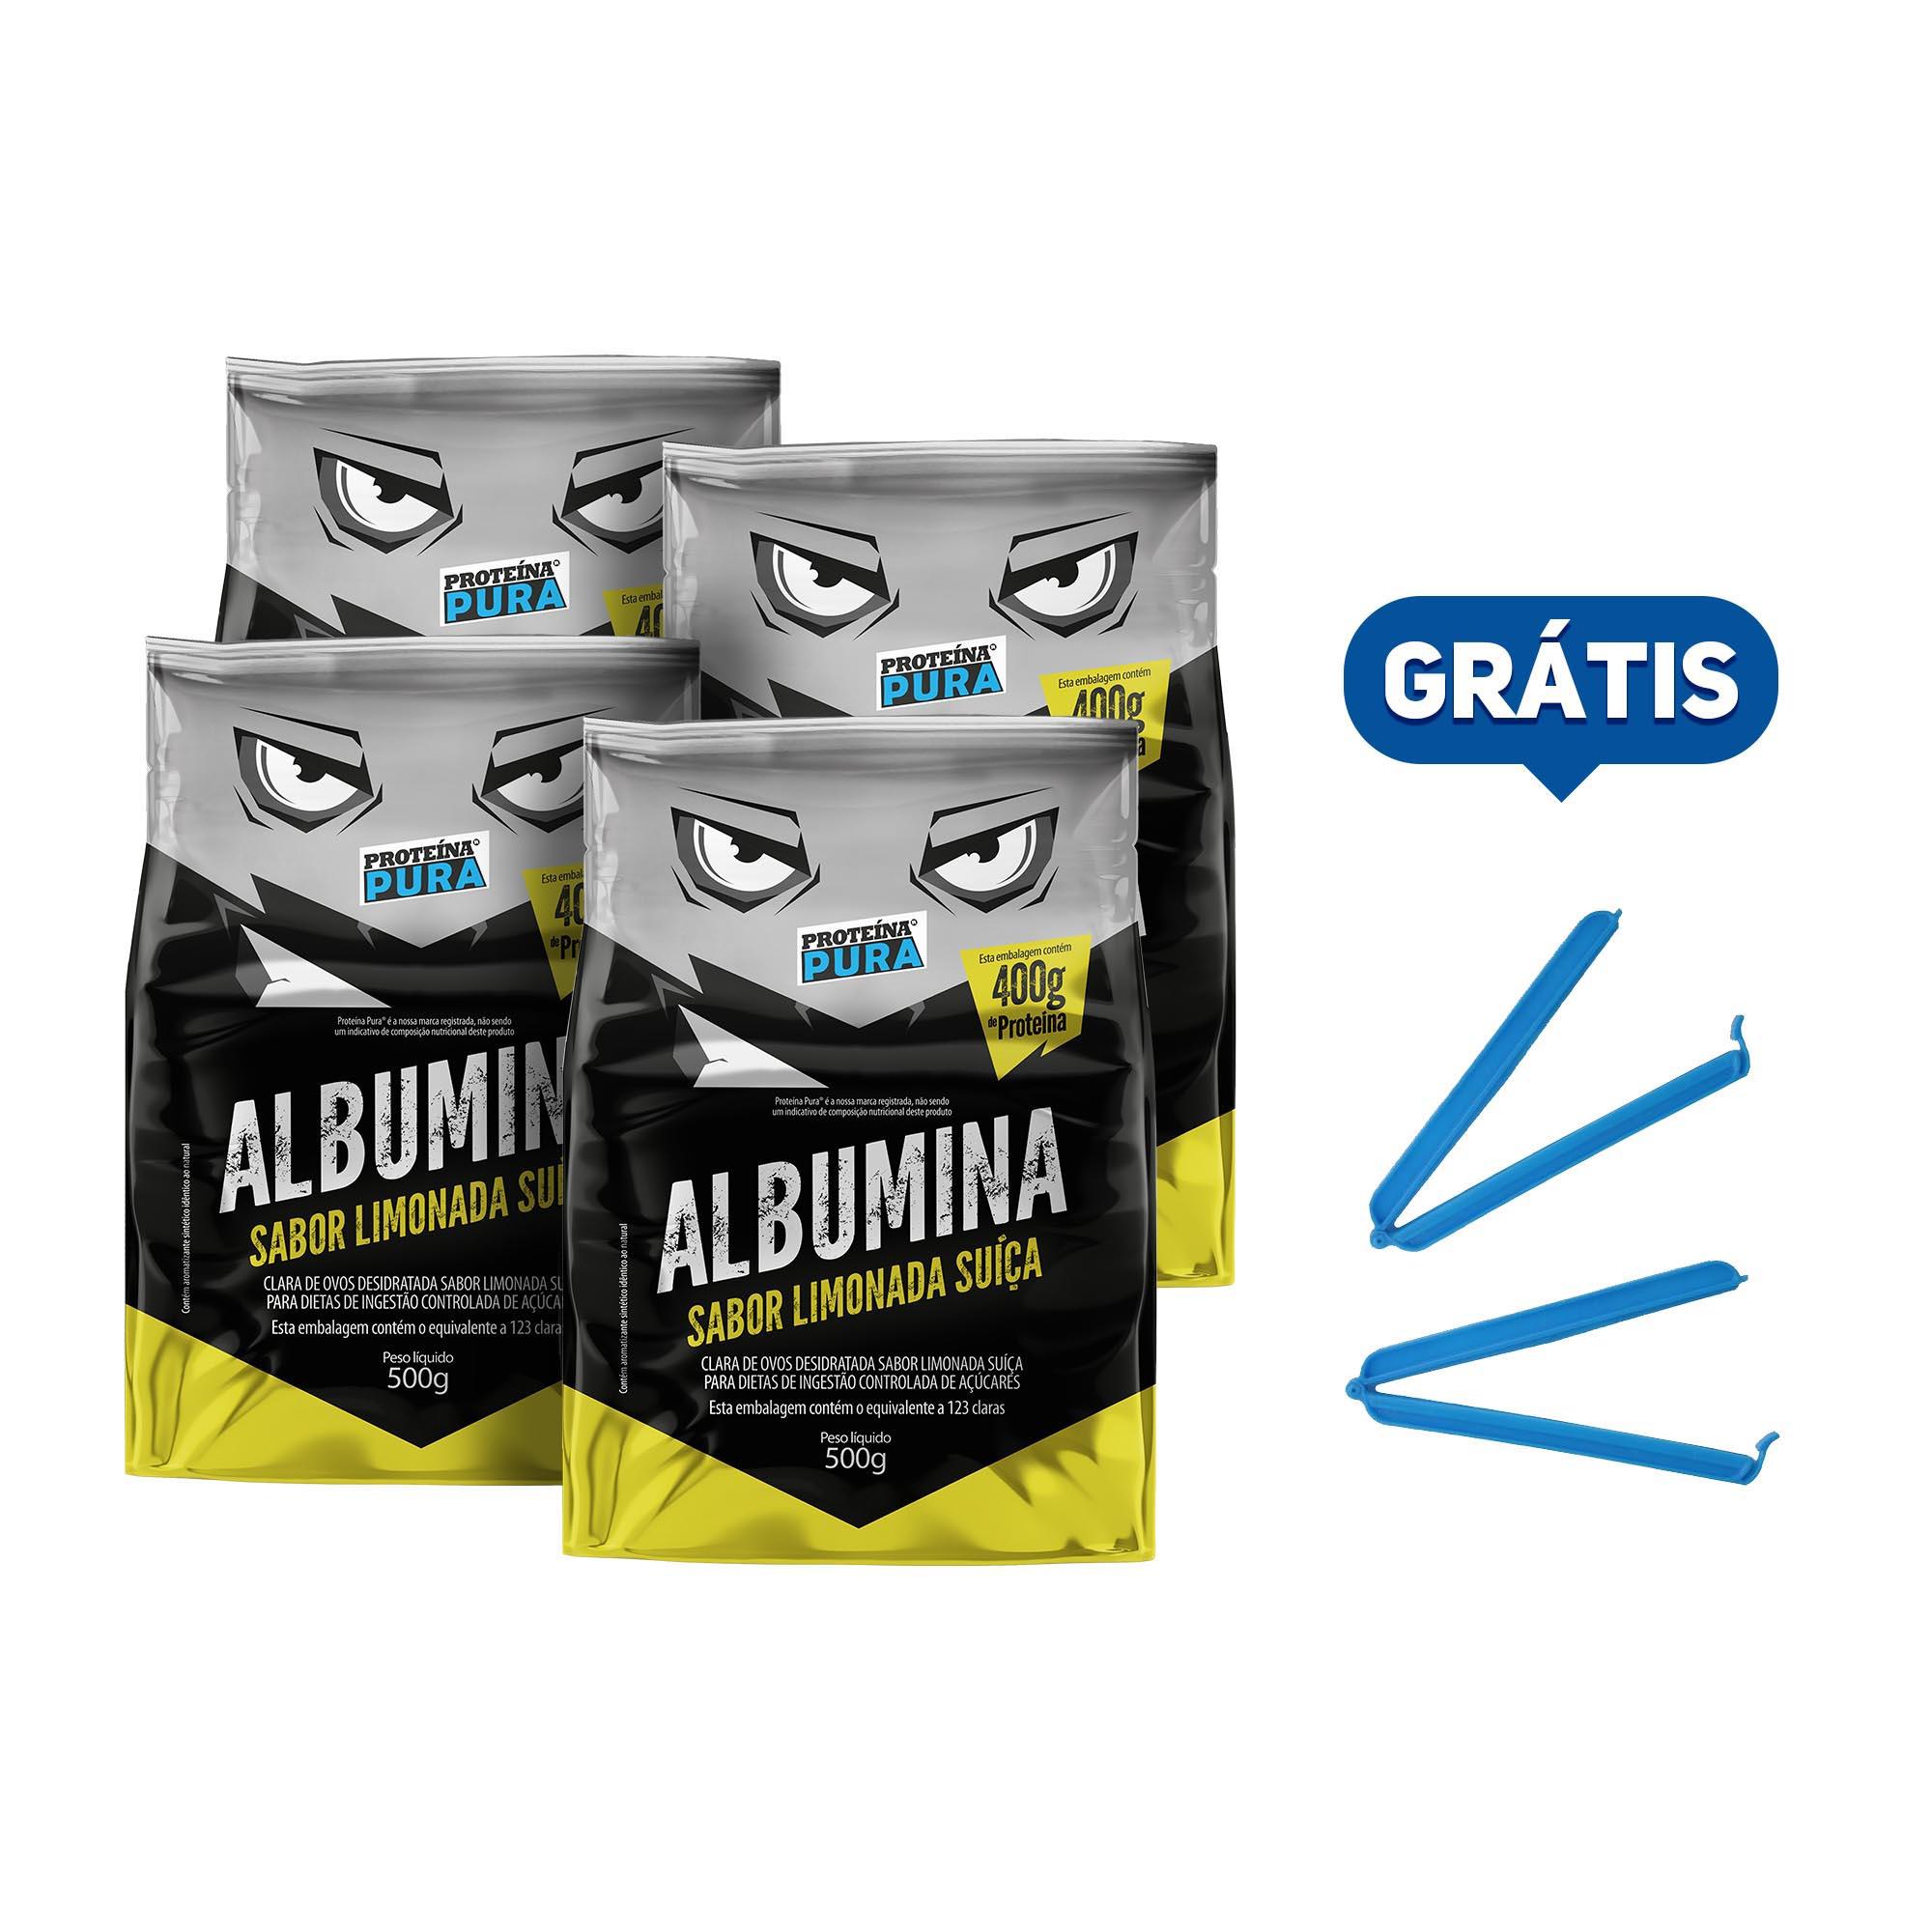 Kit Albumina Limonada Suíça - (4 un x 500g) - Proteína Pura